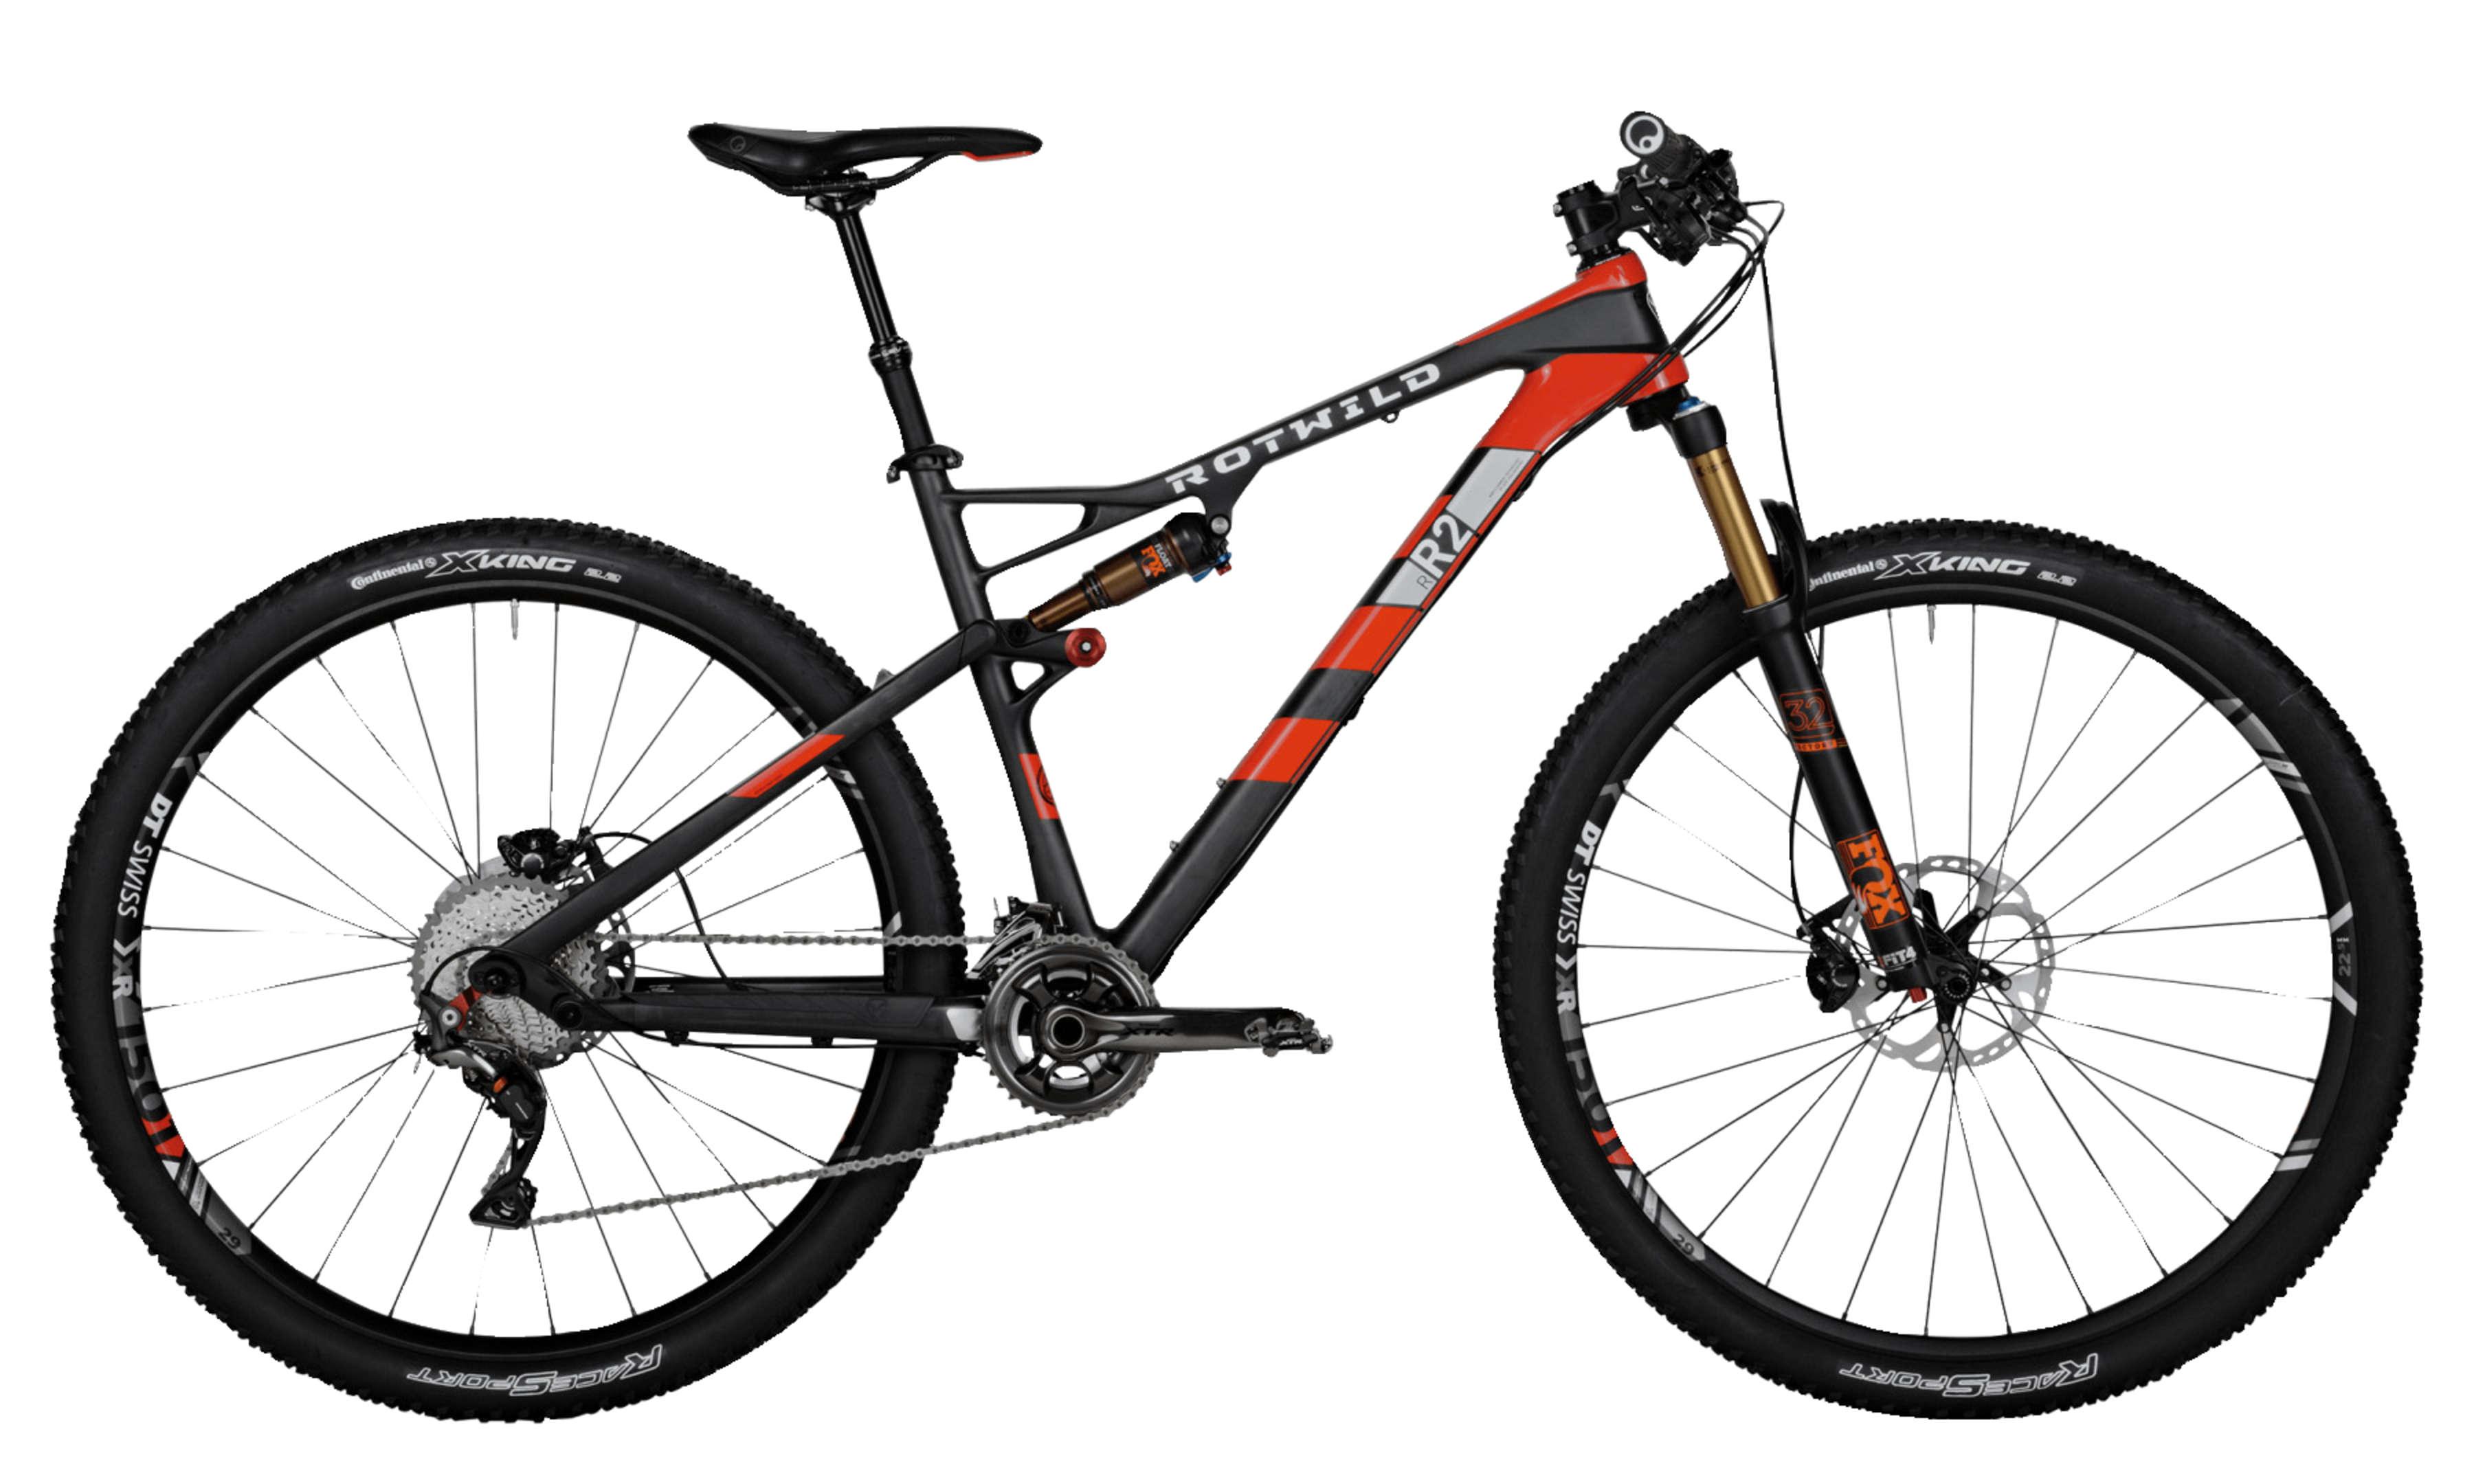 rotwild mtb r r2 fs 29 evo eurorad bikeleasingeurorad bikeleasing. Black Bedroom Furniture Sets. Home Design Ideas